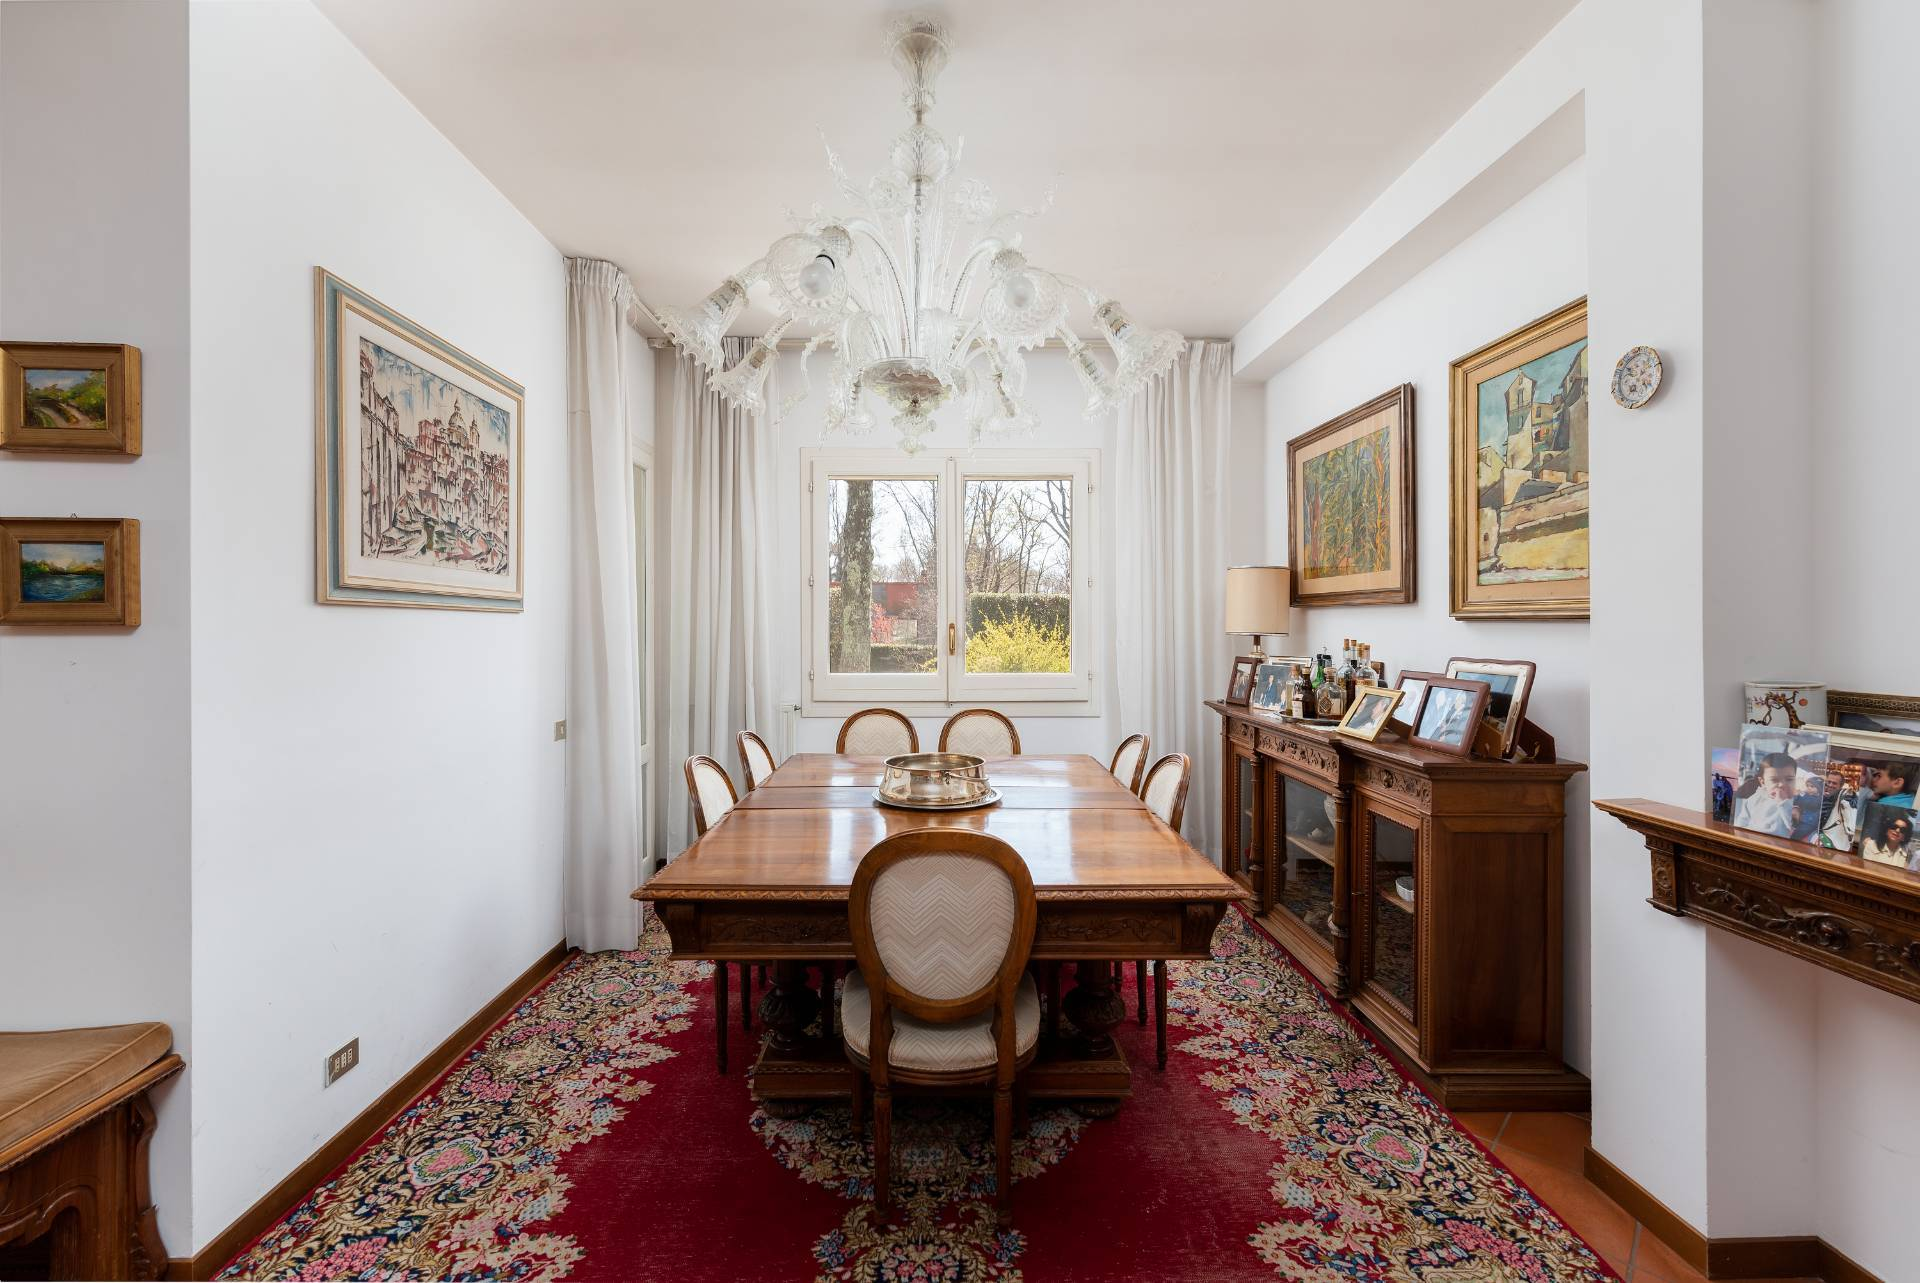 Villa in Vendita a Ariccia: 5 locali, 583 mq - Foto 5